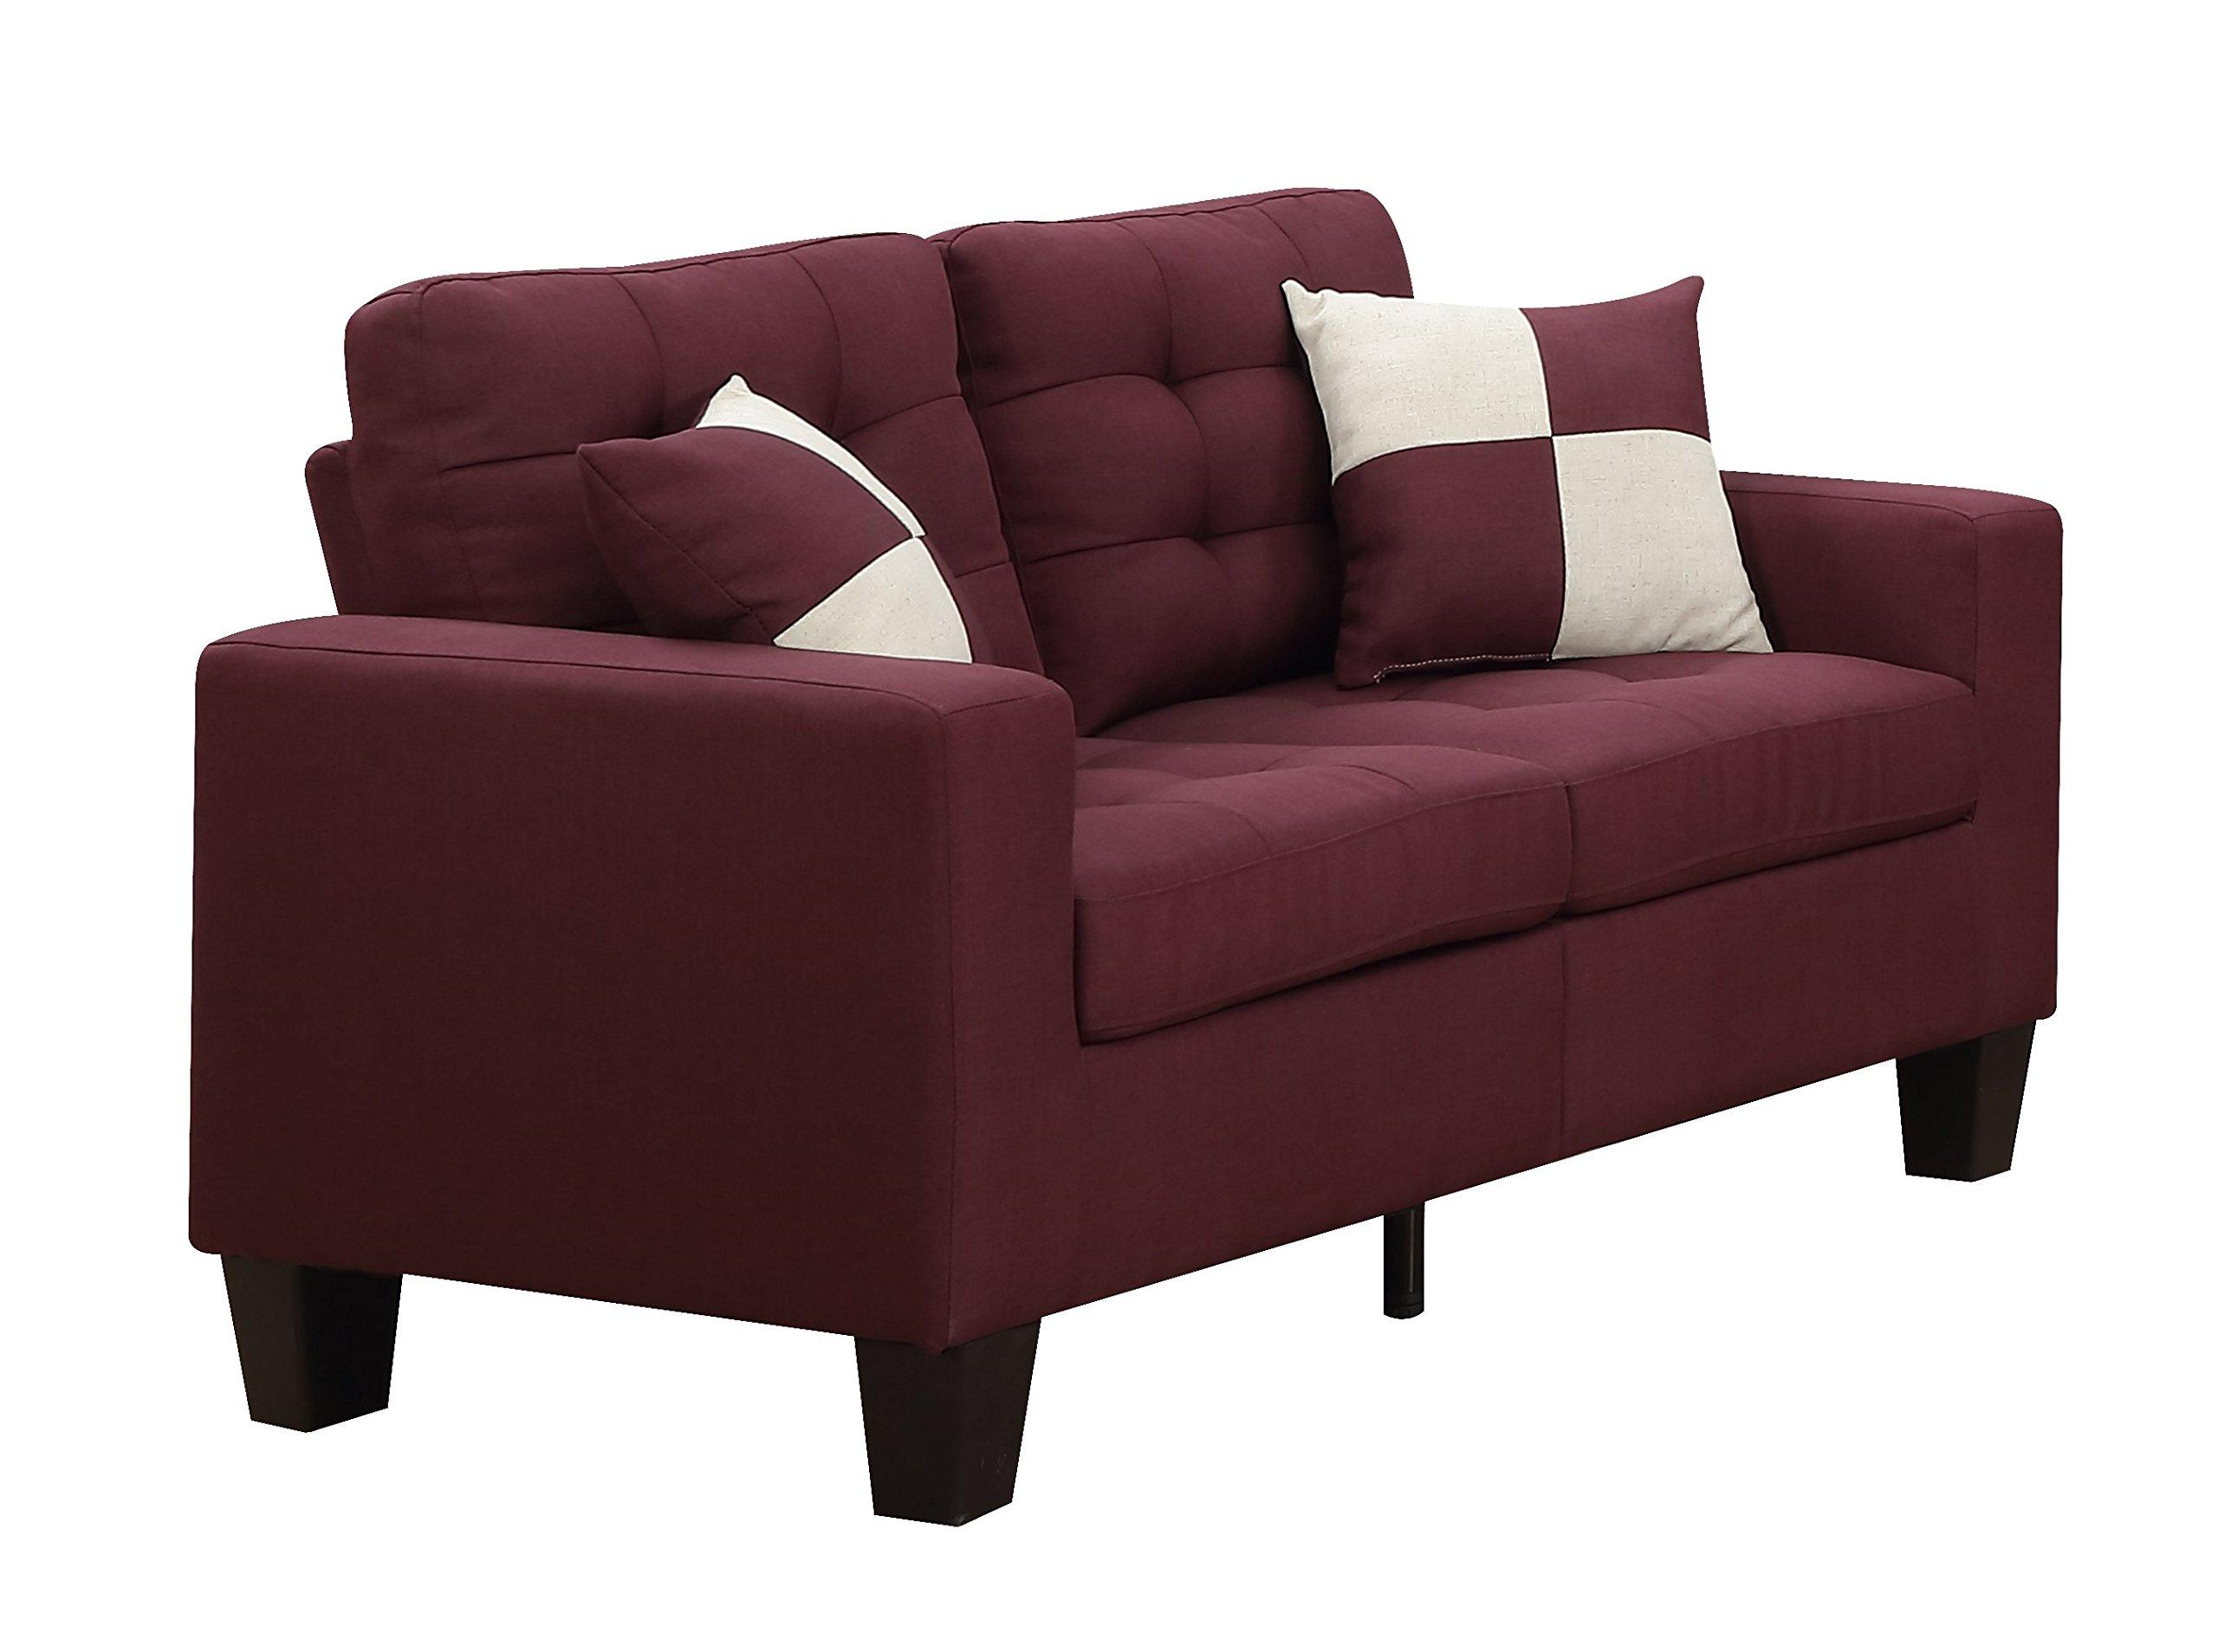 Furniture World Aston Love Seat, Purple